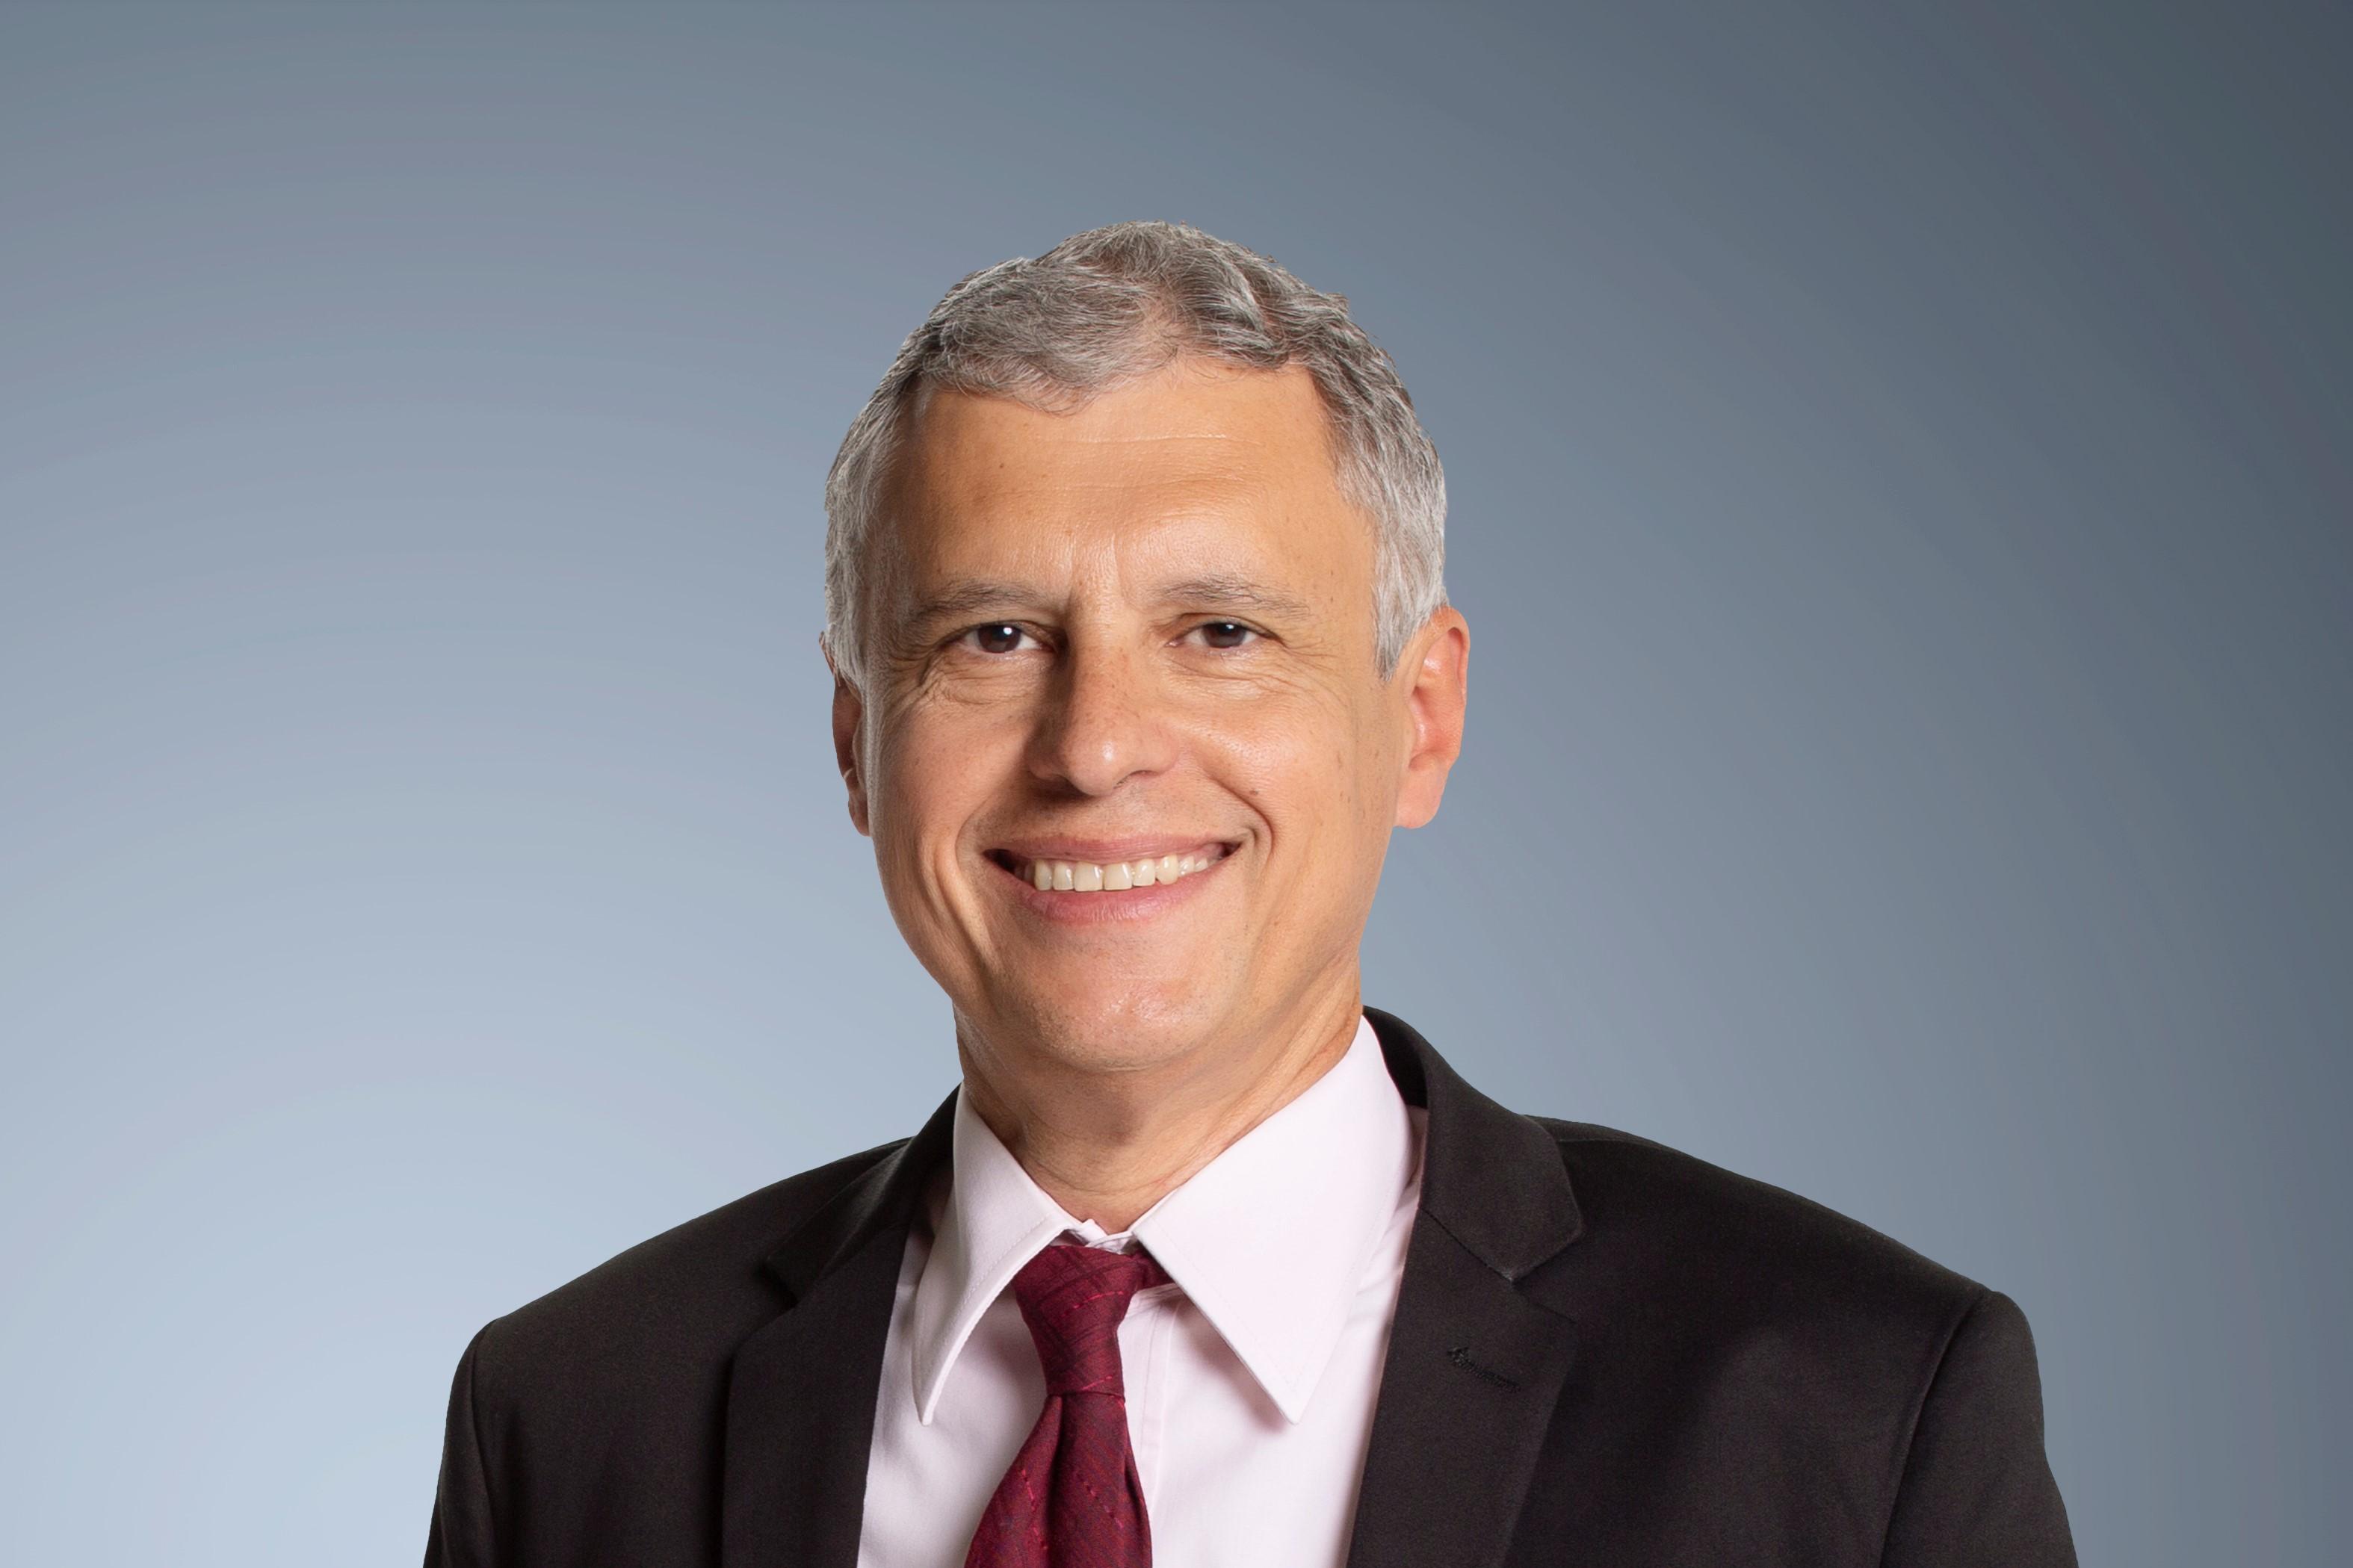 Fernando Molica comentarista e colunista CNN Brasil